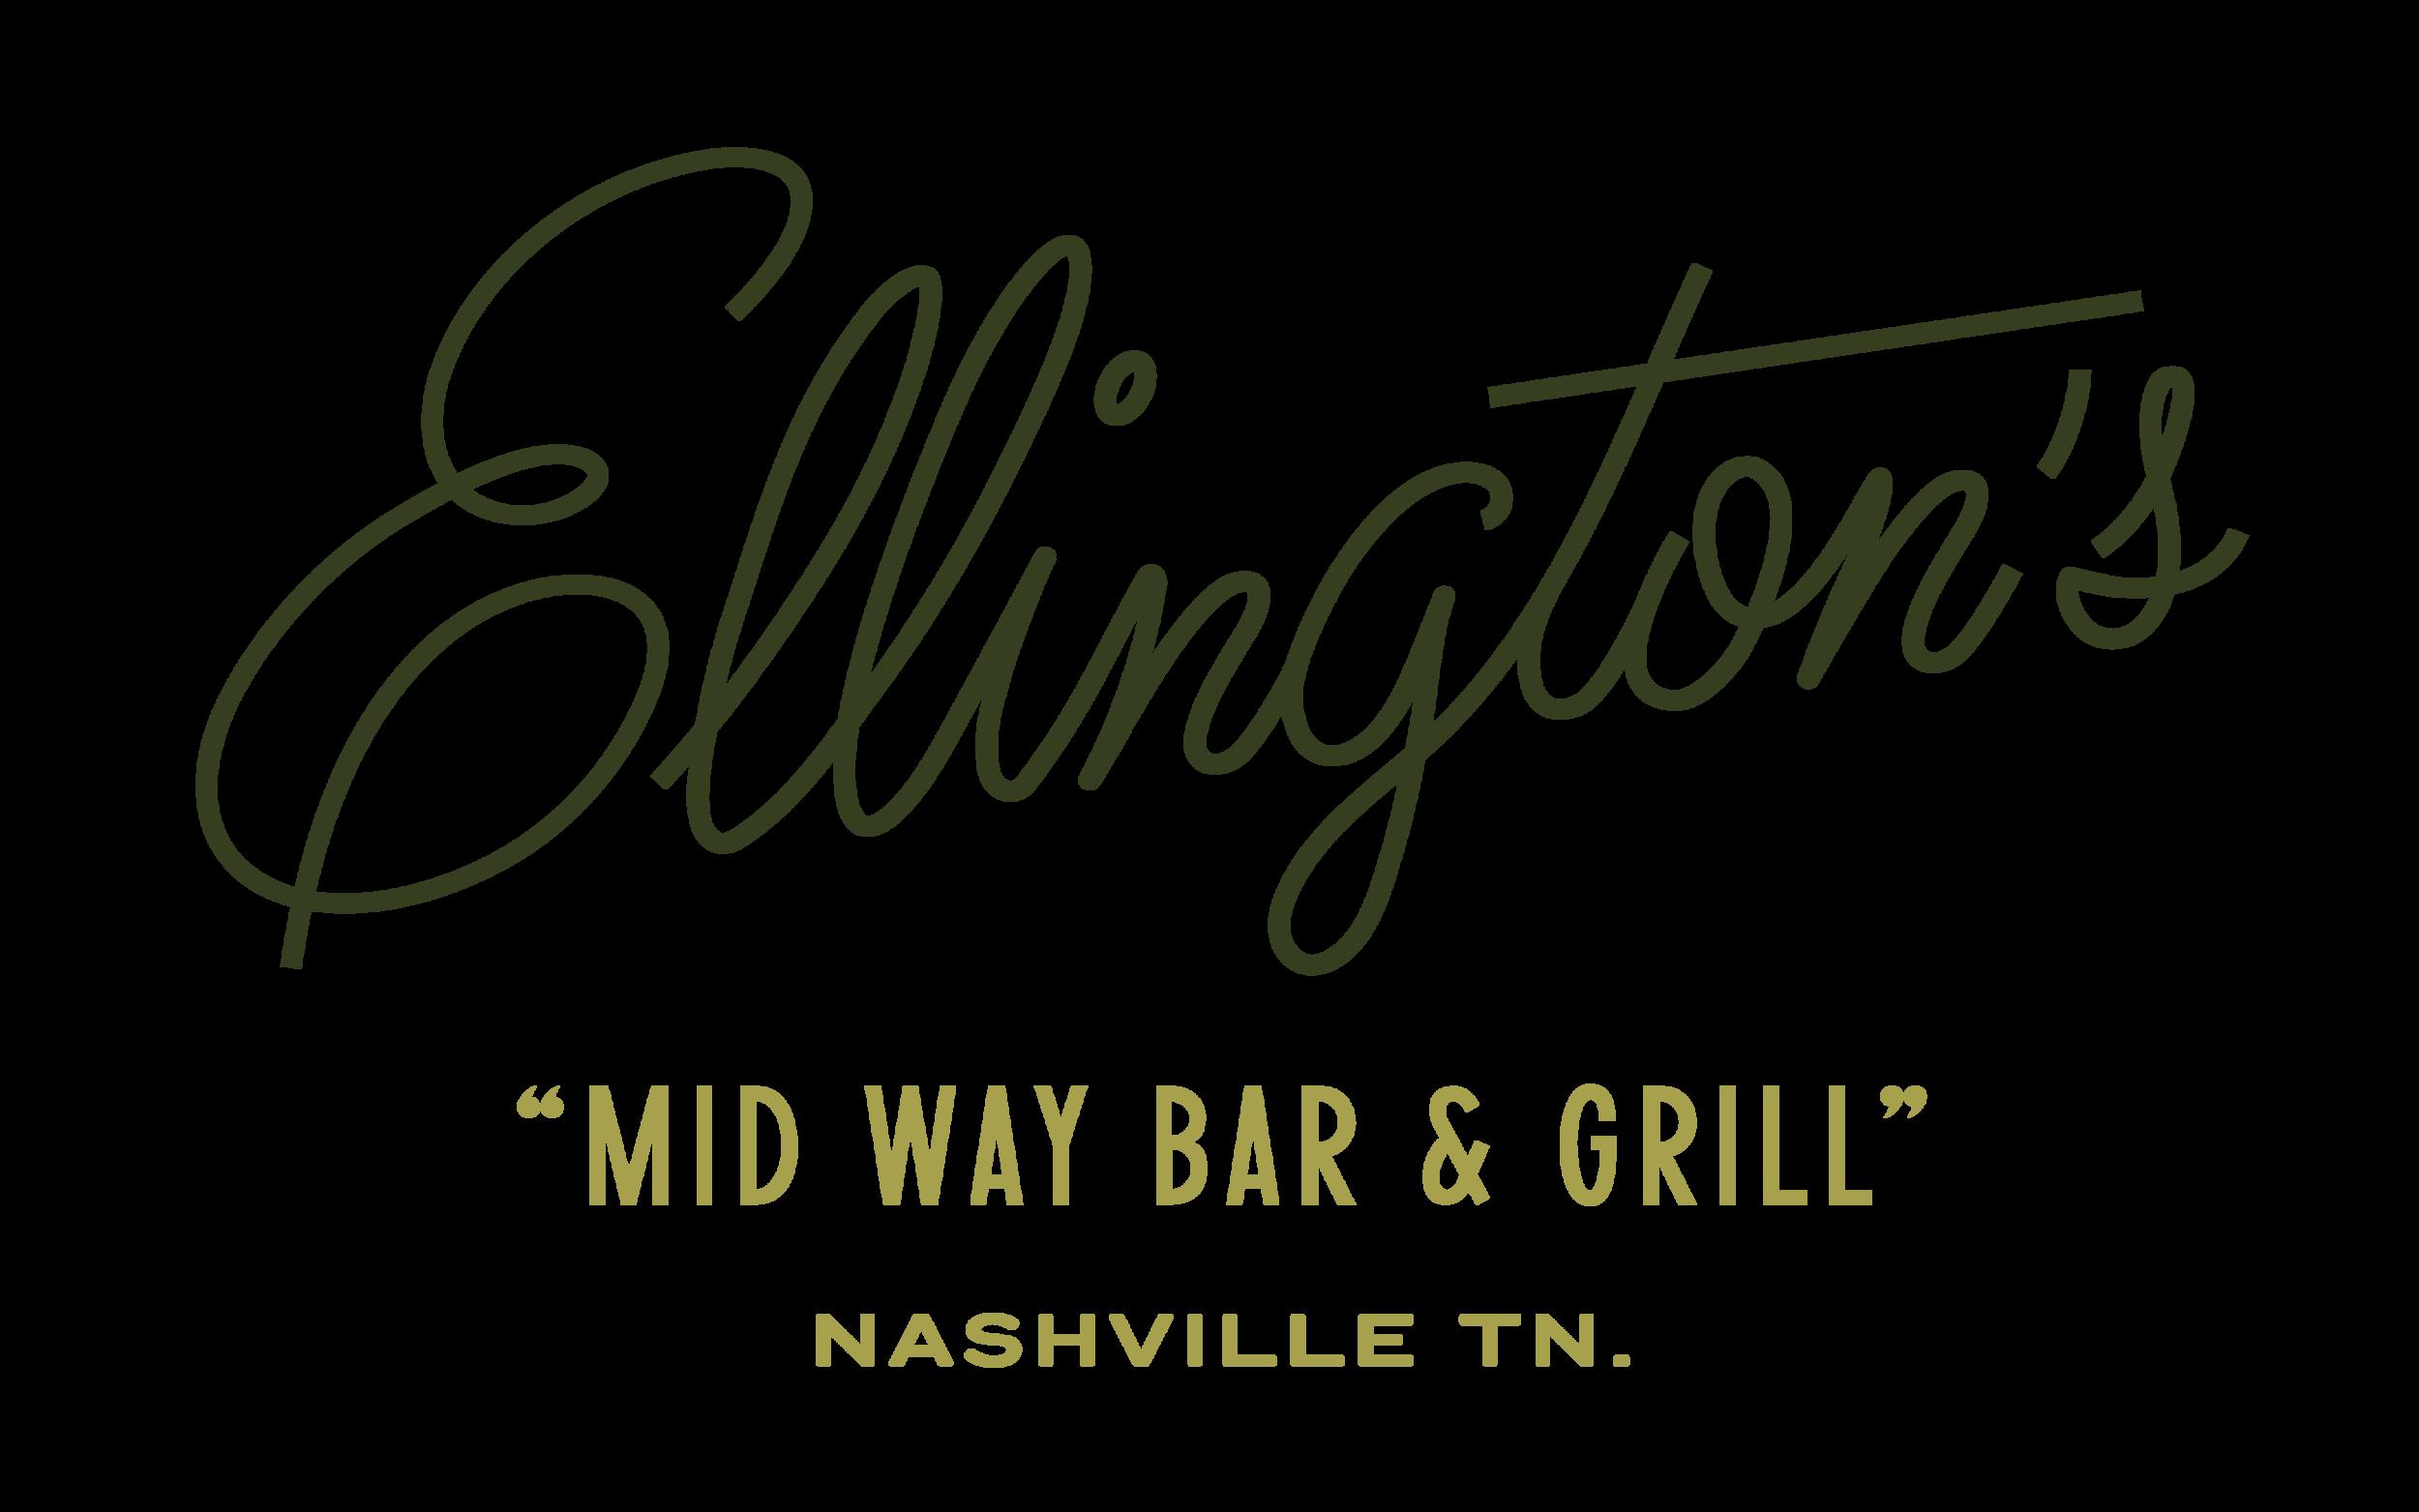 ellingtons-01Logo.png